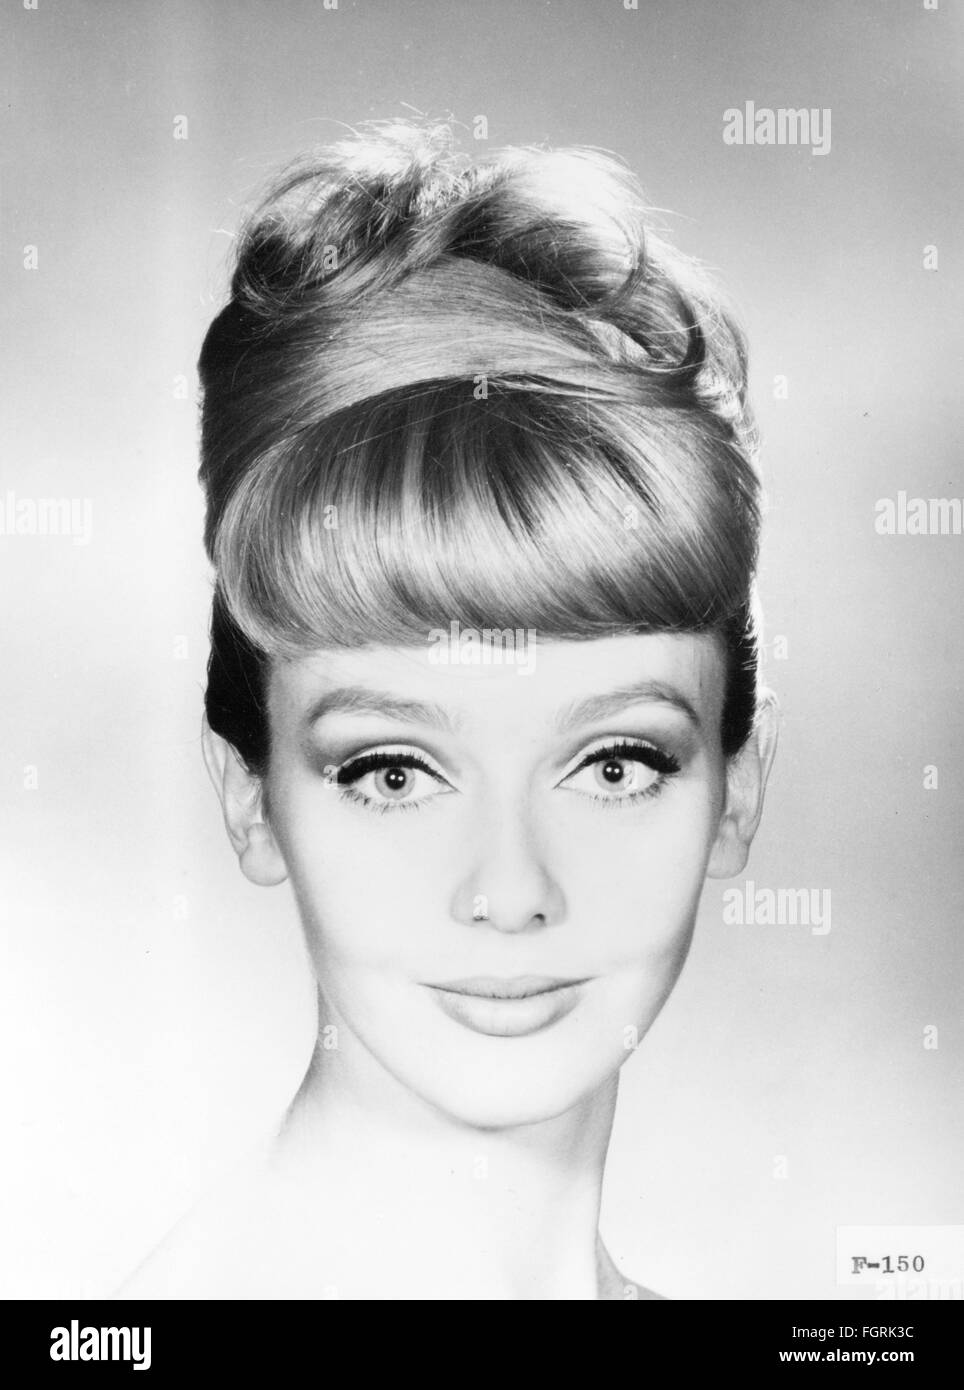 Frisuren 60Er Jahre | Mode 60er Jahre Frisuren Put Up Frisur Juli 1964 Additional